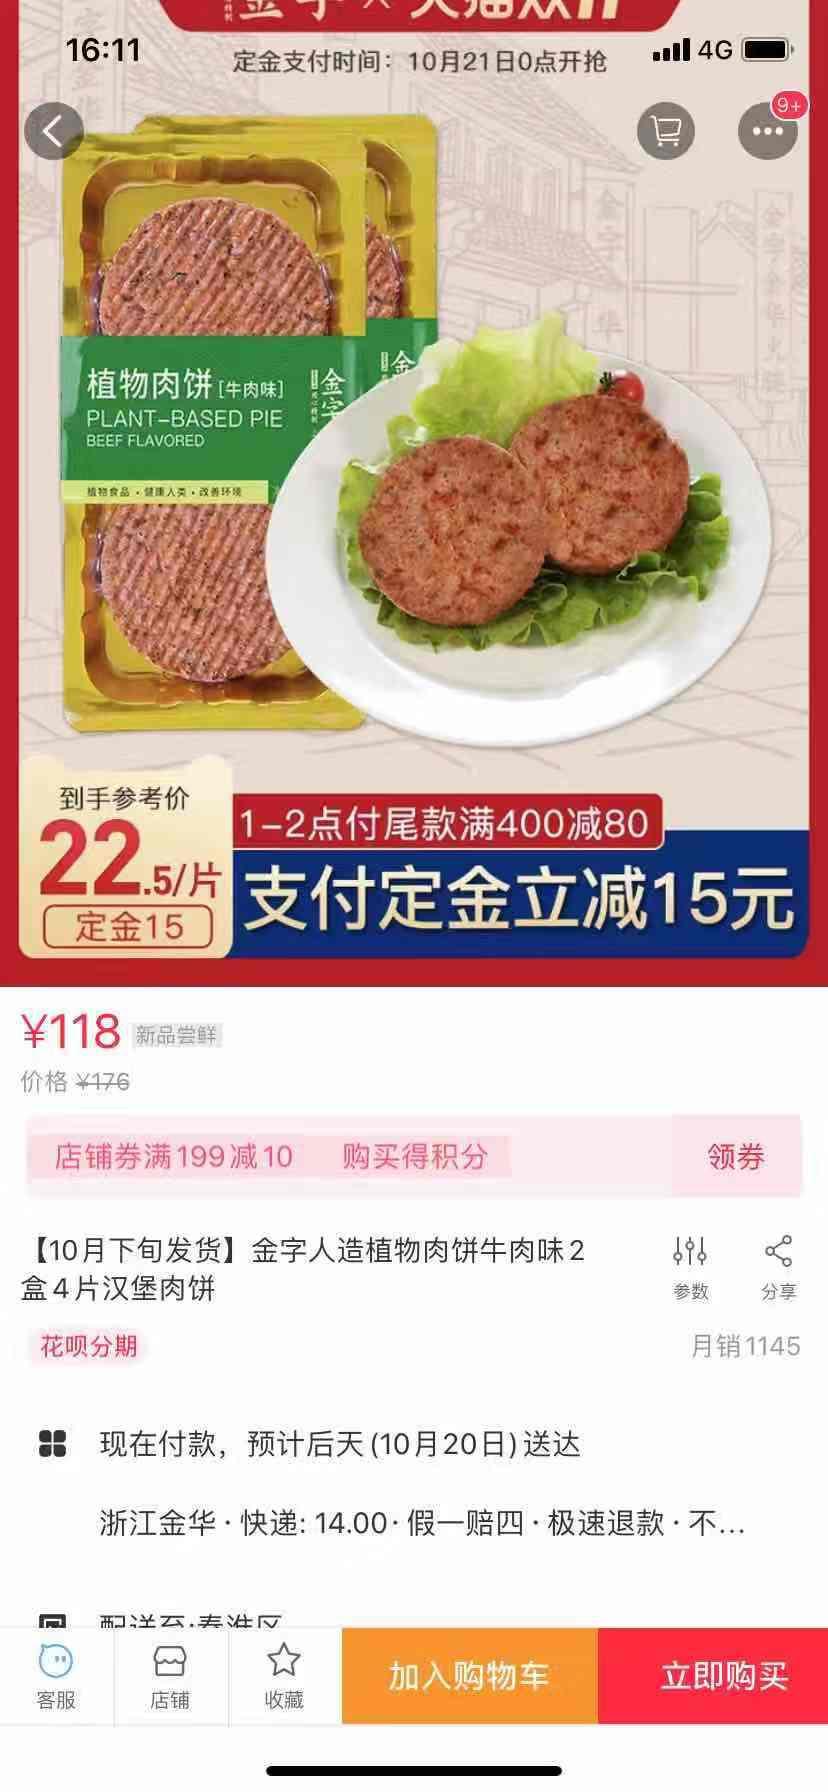 "P2P交流-投资理财金字火腿抢滩""人造肉"",6天劳绩5涨停理财平台(1)"